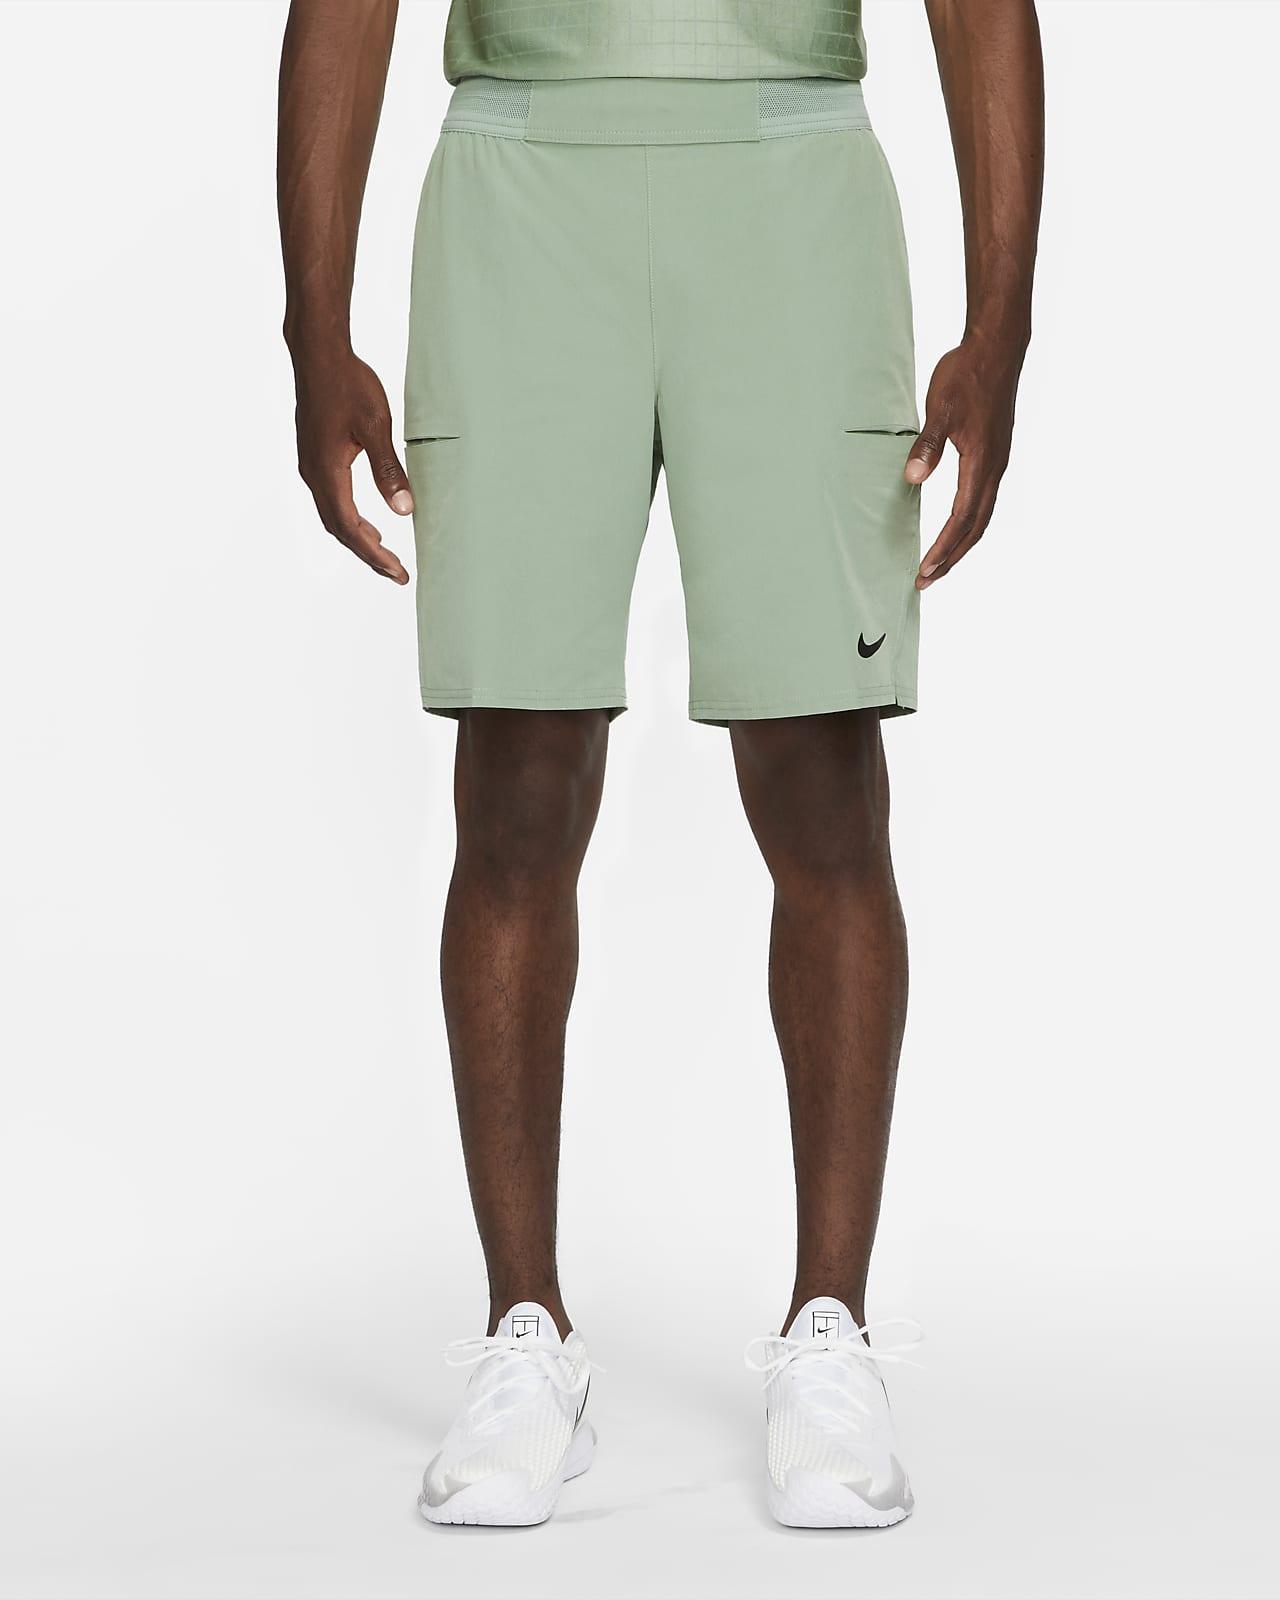 NikeCourt Dri-FIT Advantage Men's 23cm (approx.) Tennis Shorts